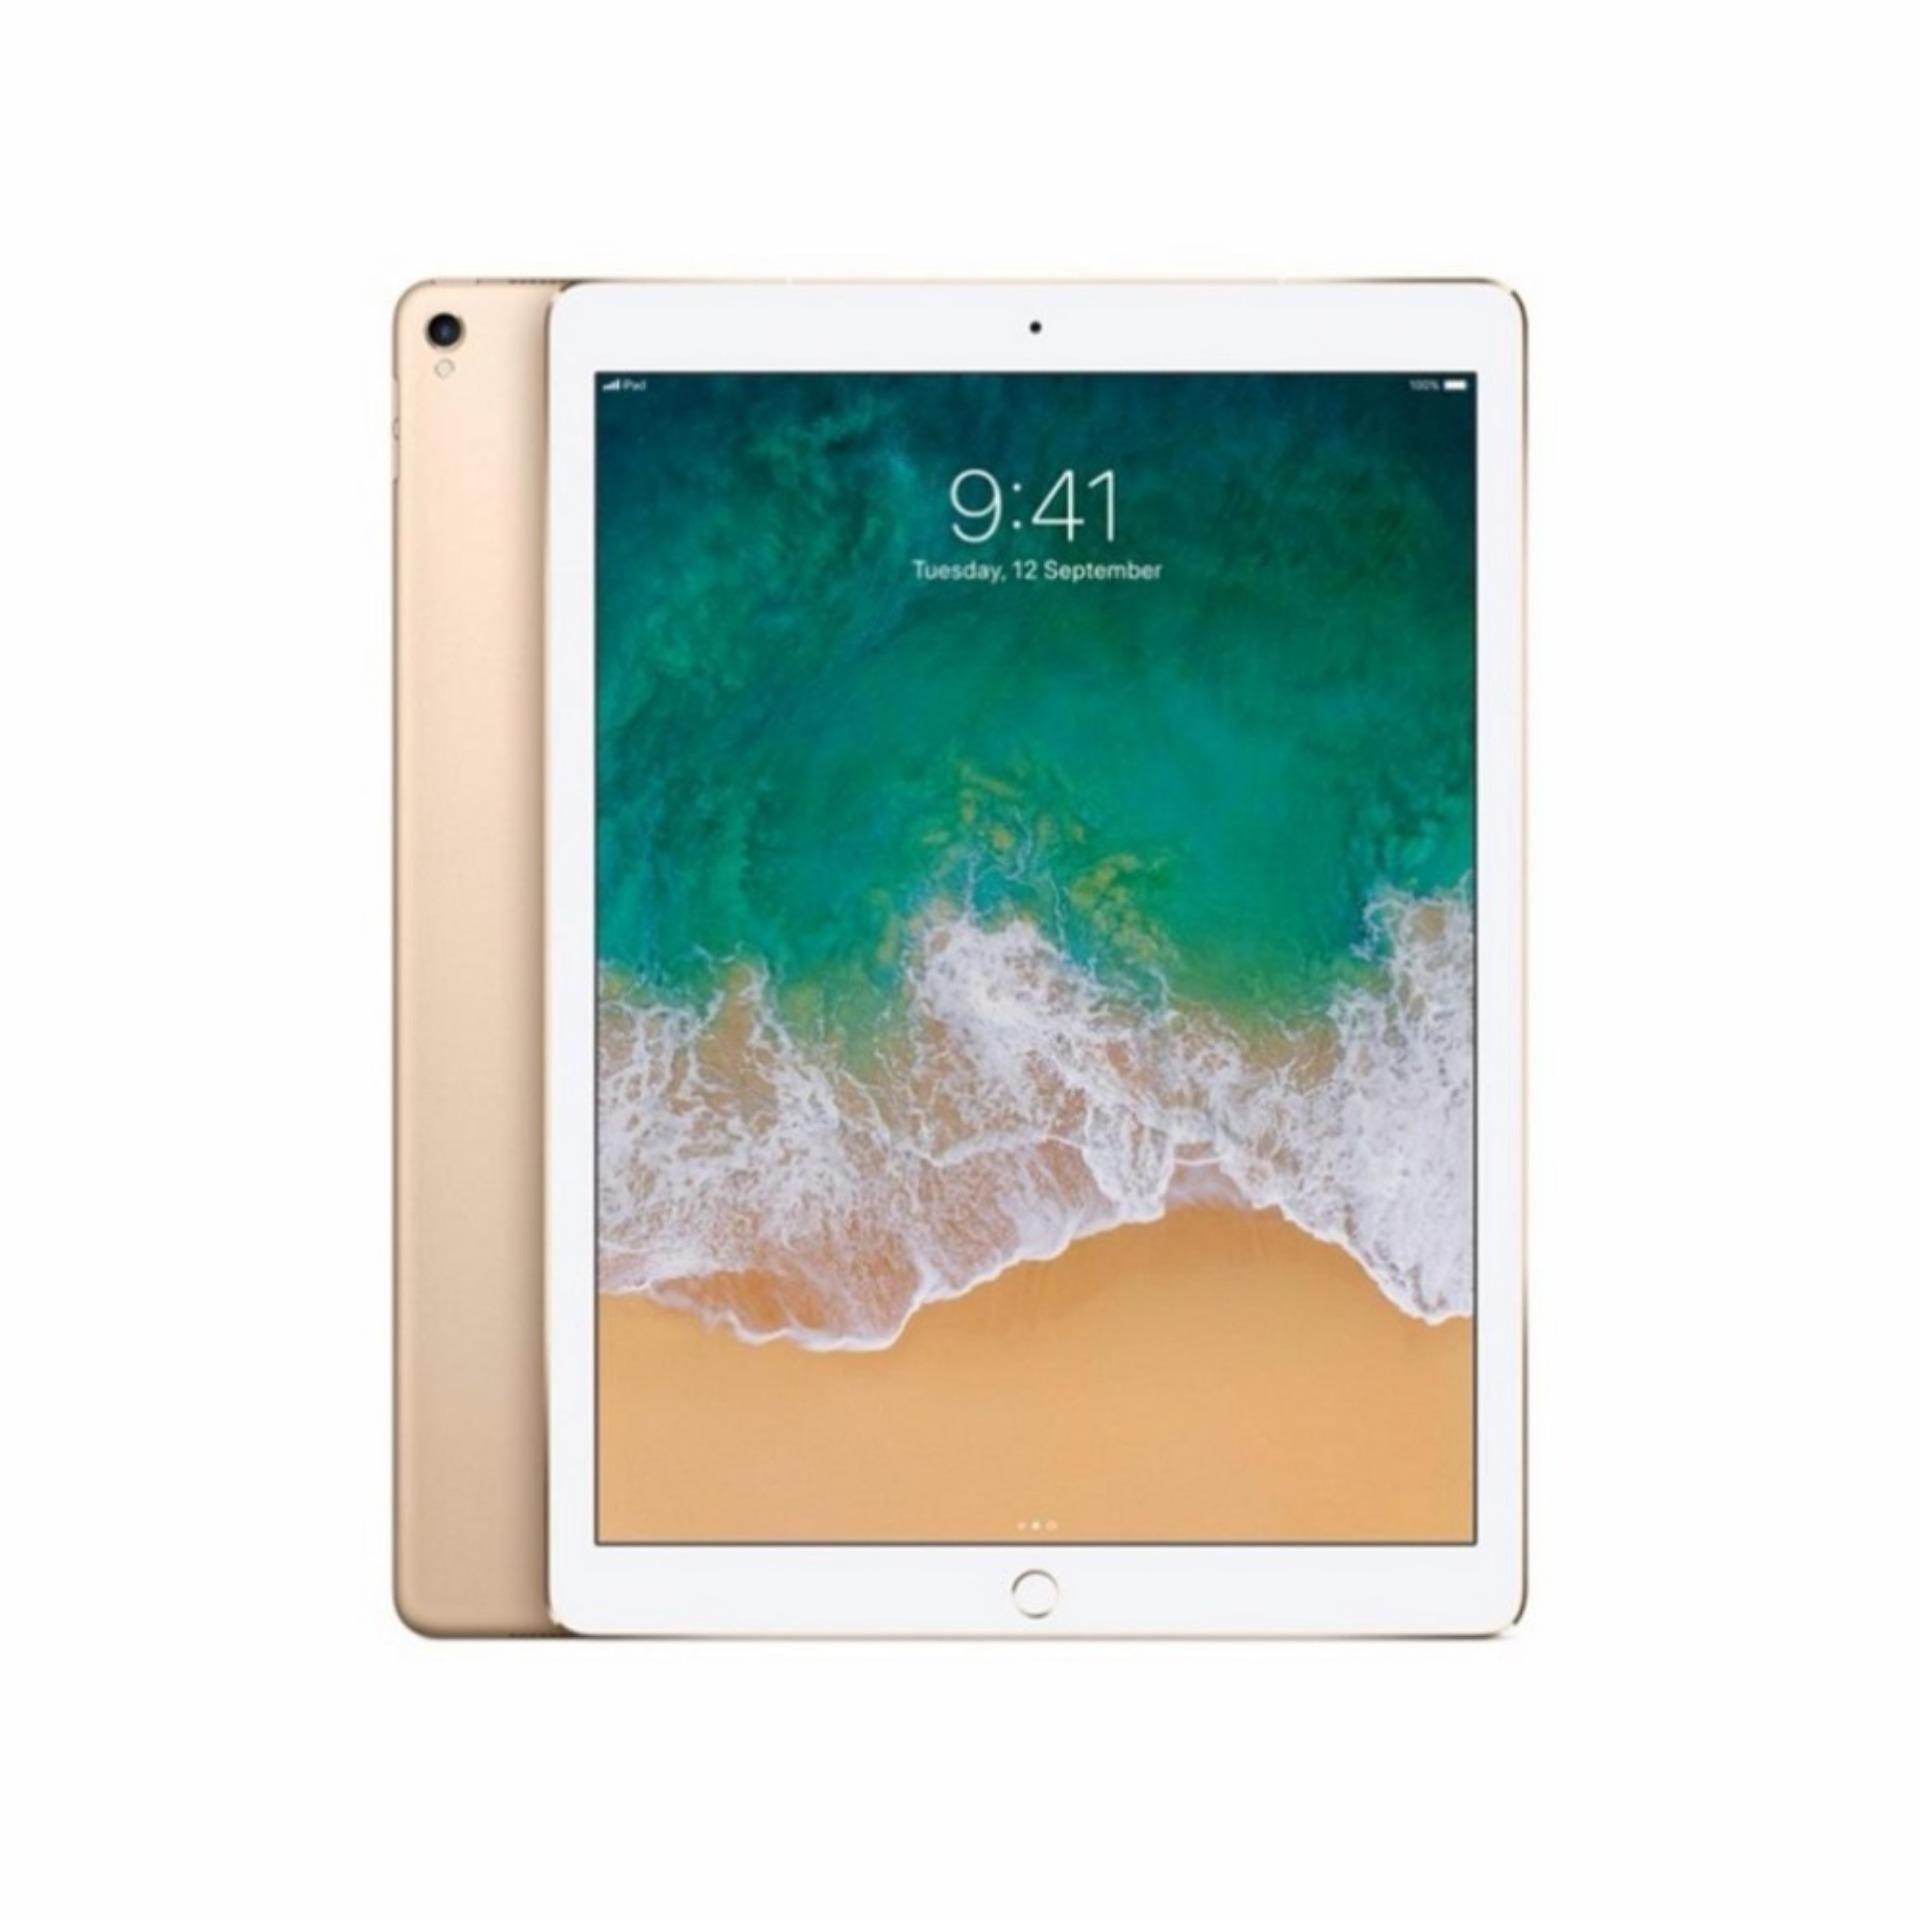 Apple iPad Pro 12.9-inch Wi-Fi 64GB Gold